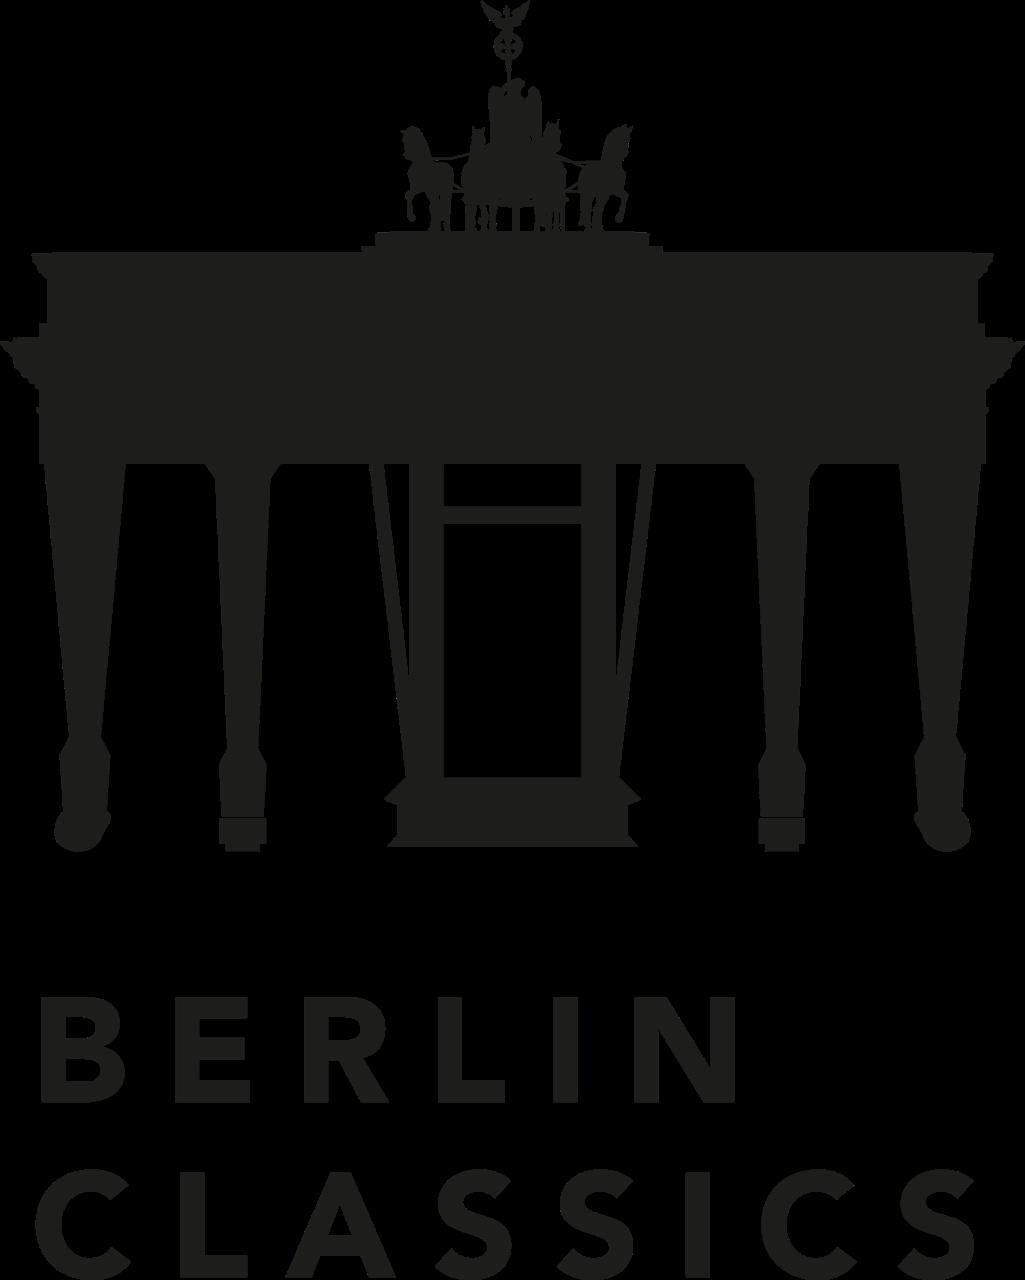 Berlin_Klassik_Logo_Black300dpi